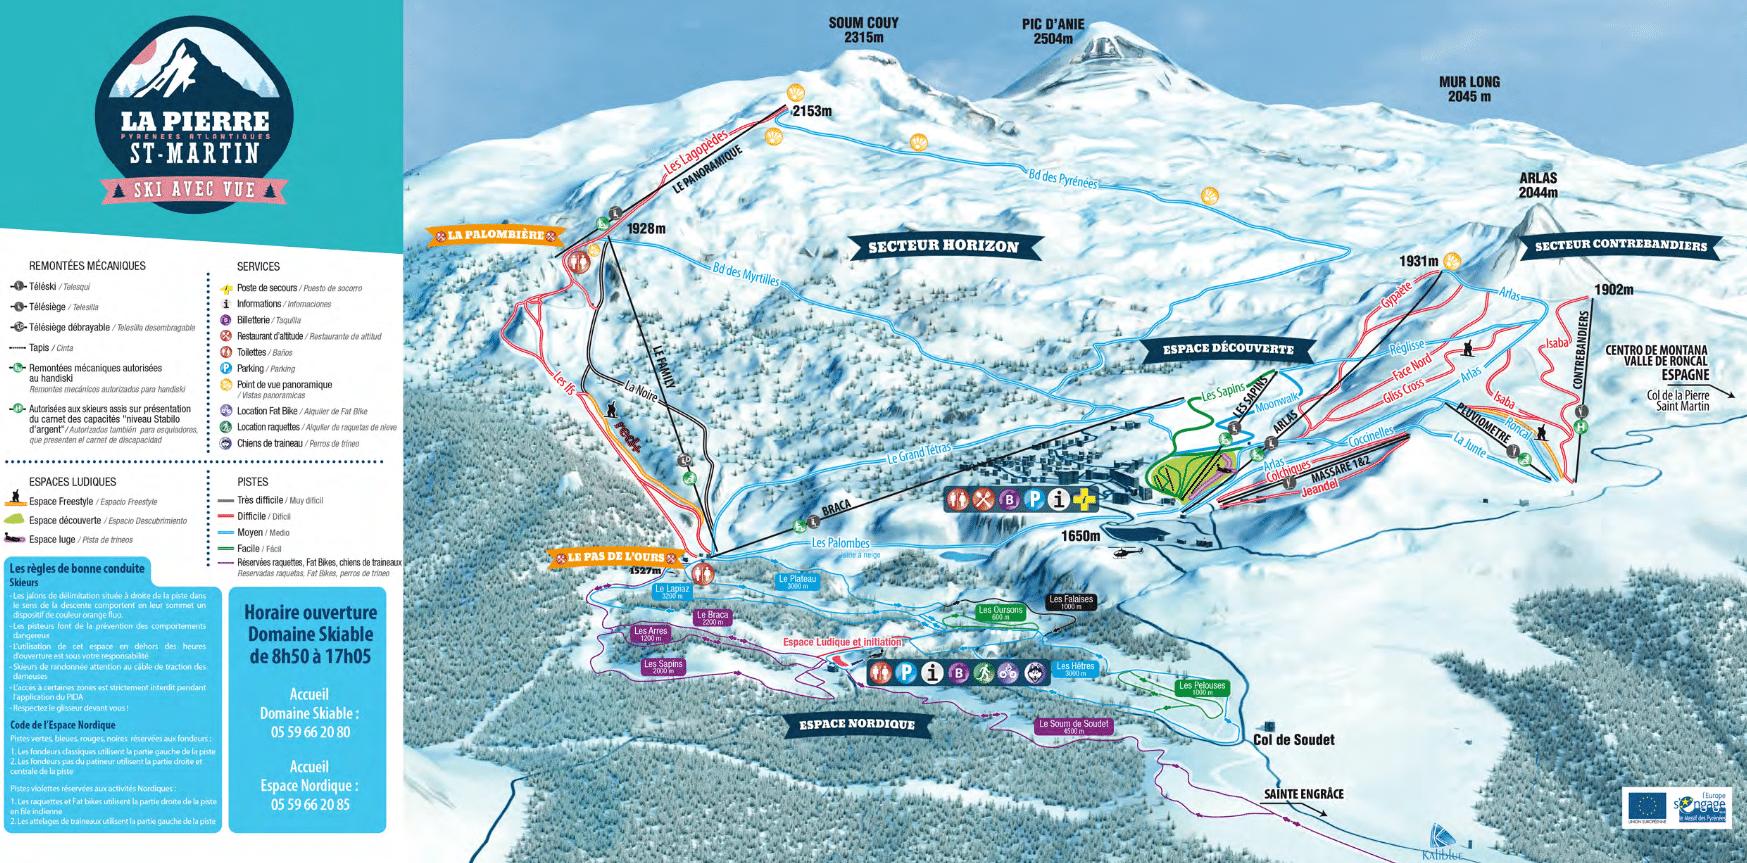 La Pierre Saint Martin - Plan des pistes de ski